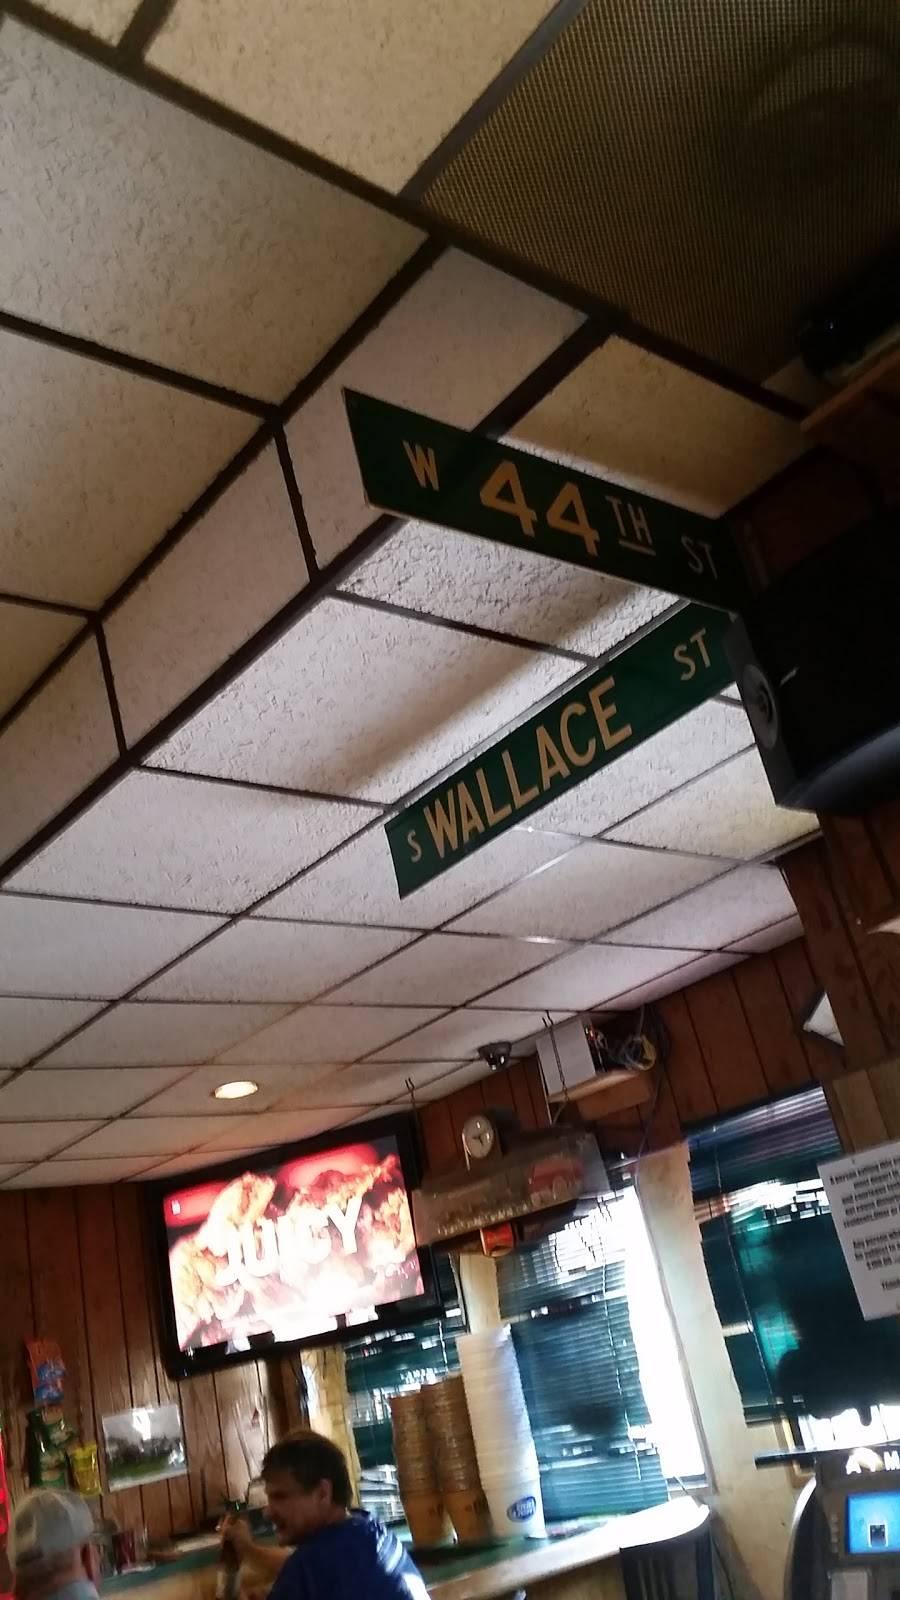 Kellys Tavern | restaurant | 4403 S Wallace St, Chicago, IL 60609, USA